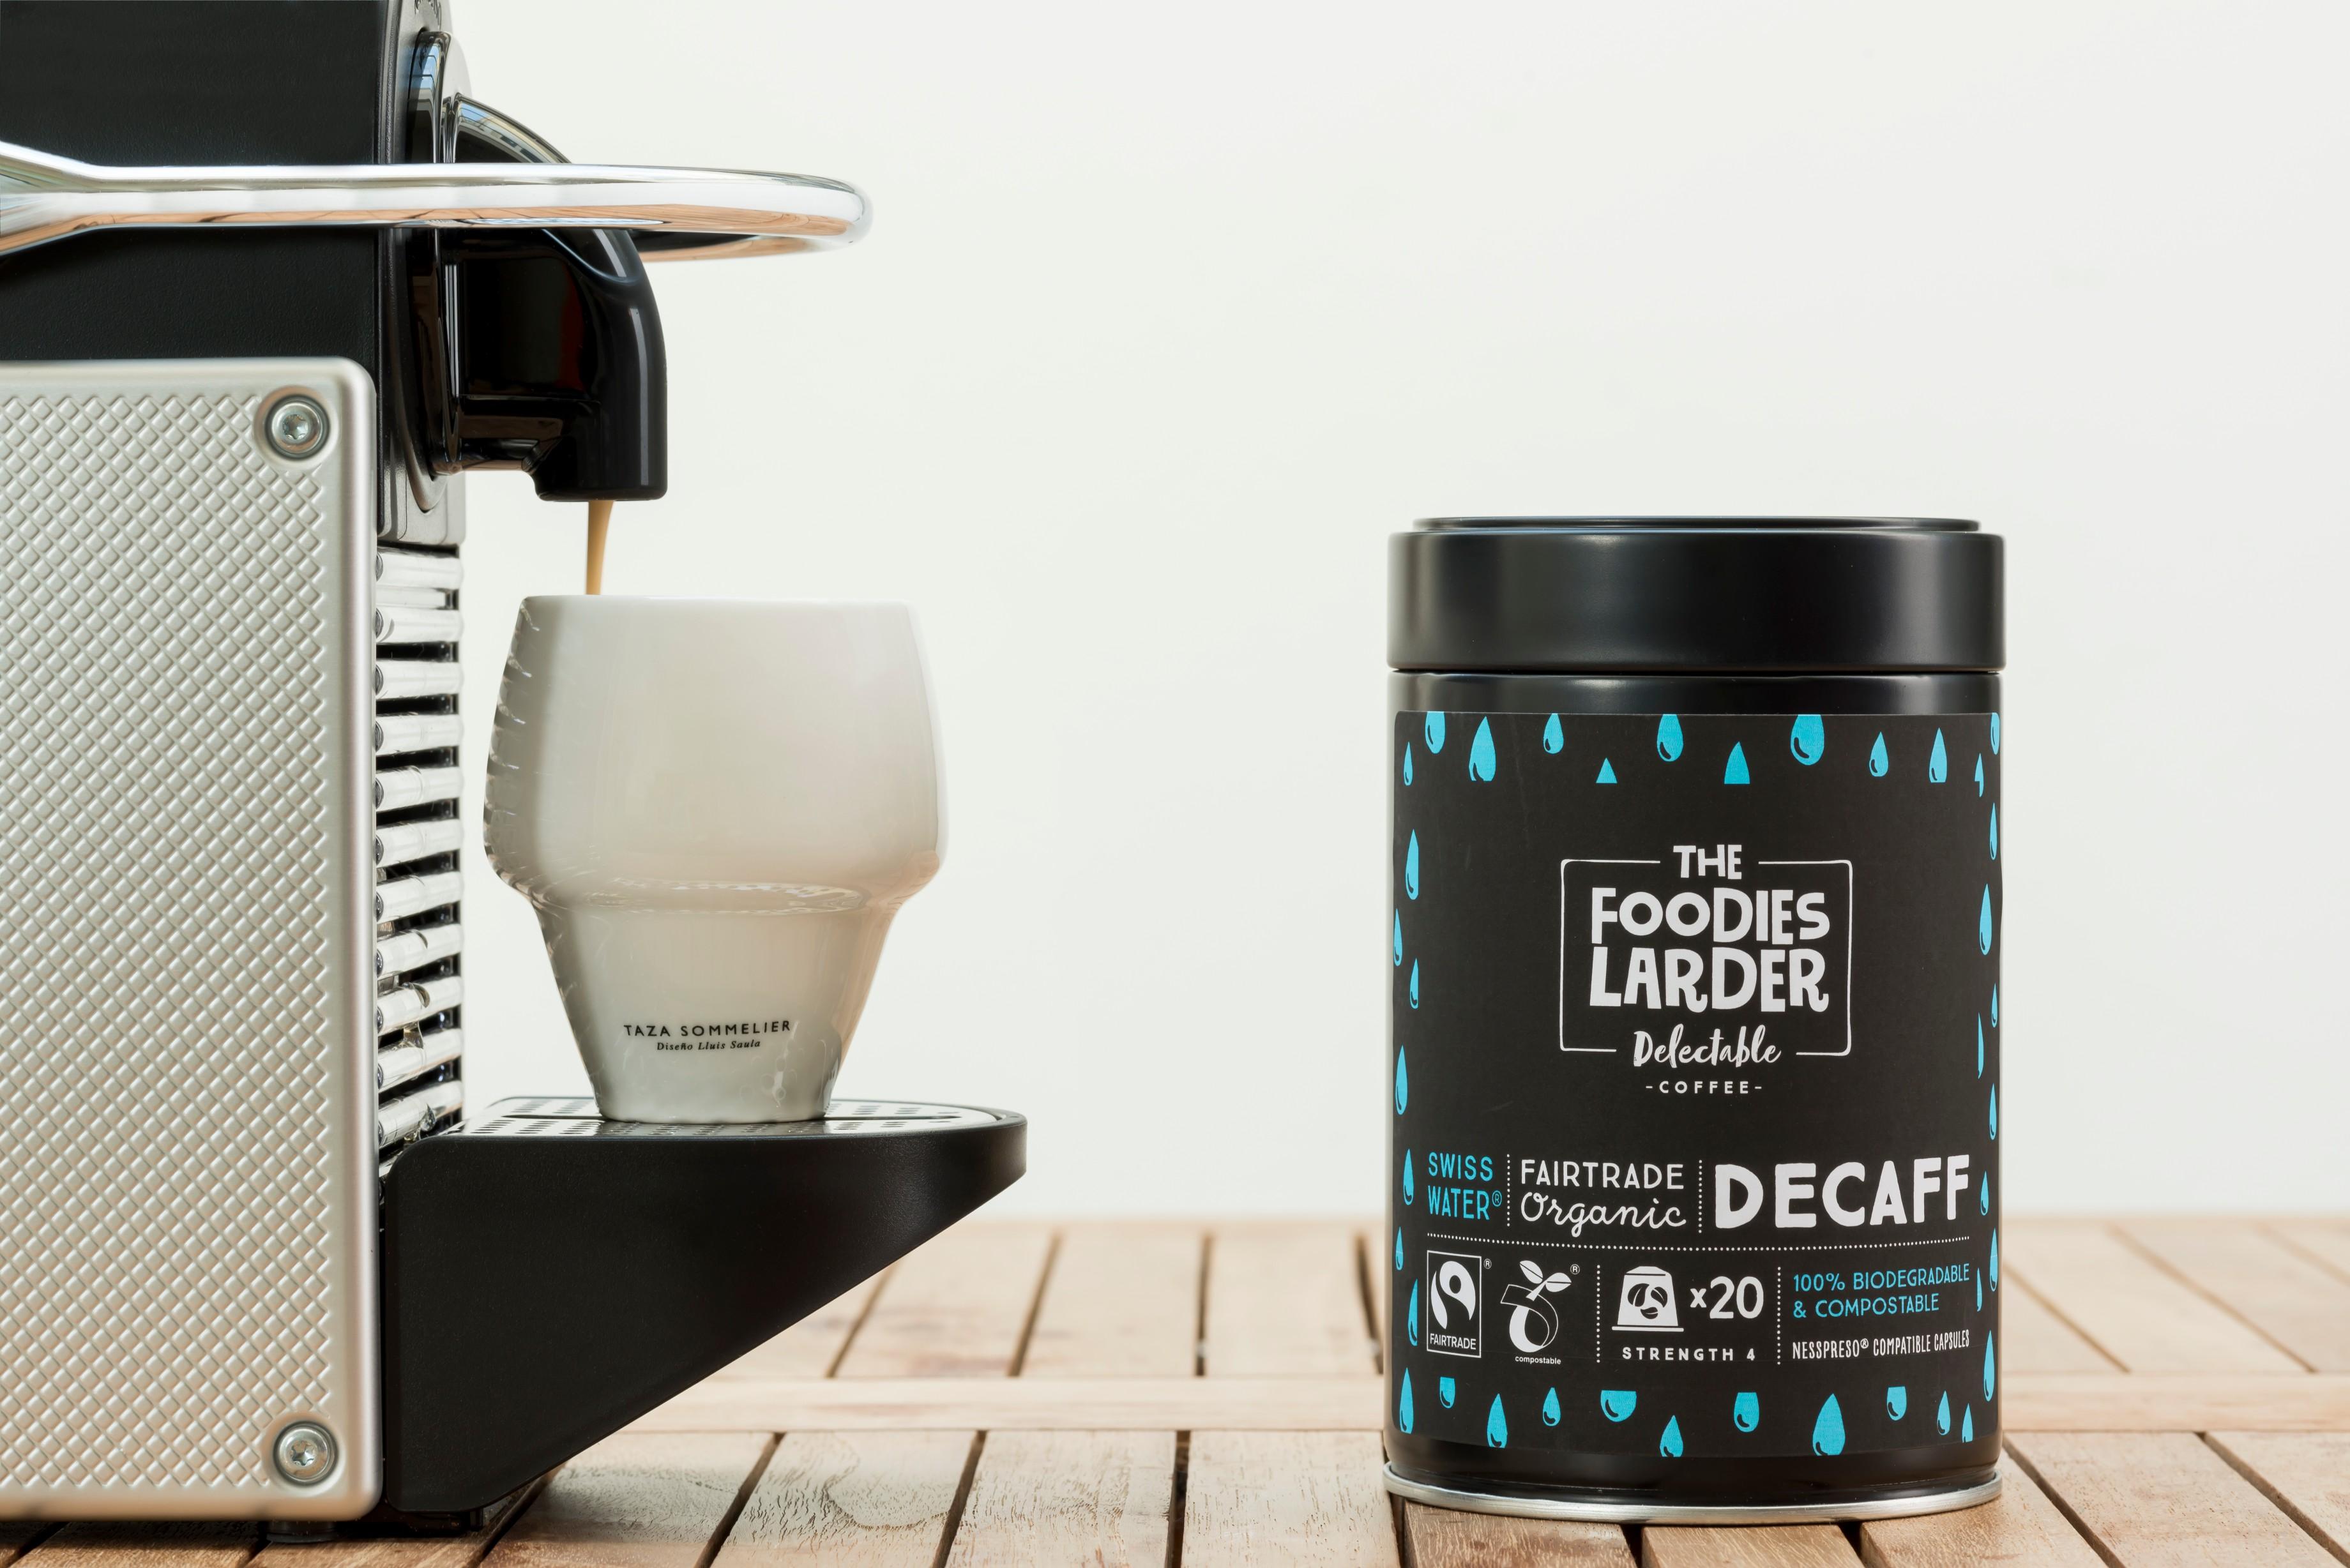 Biodegradable-compostable-Nespresso-Coffee-Capsules-organic-fairtrade-rainforest alliance-Swiss-Water-Decaff-Amazon